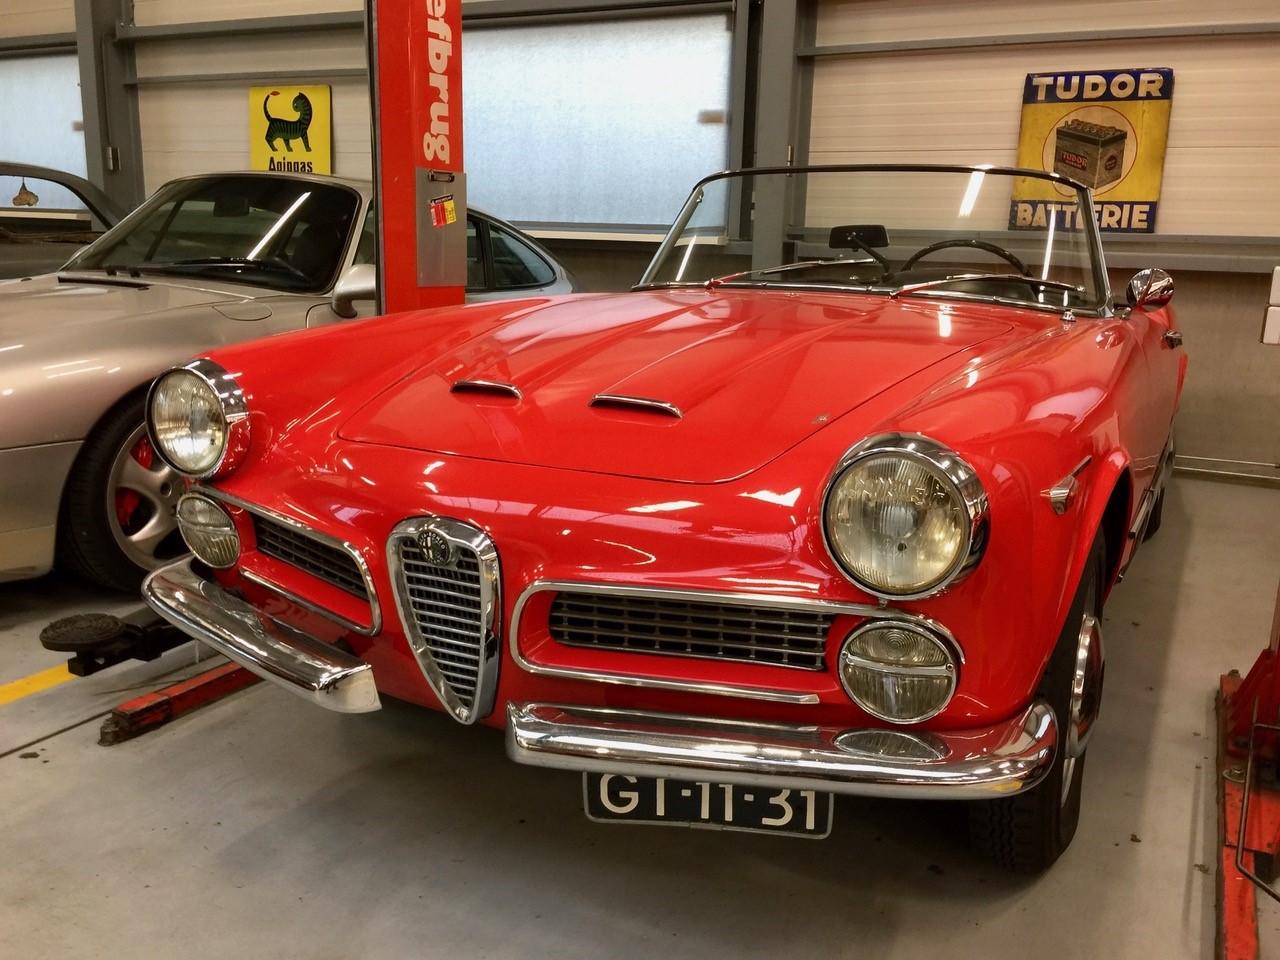 Alfa Romeo 2000 Touring Spider GT-11-31